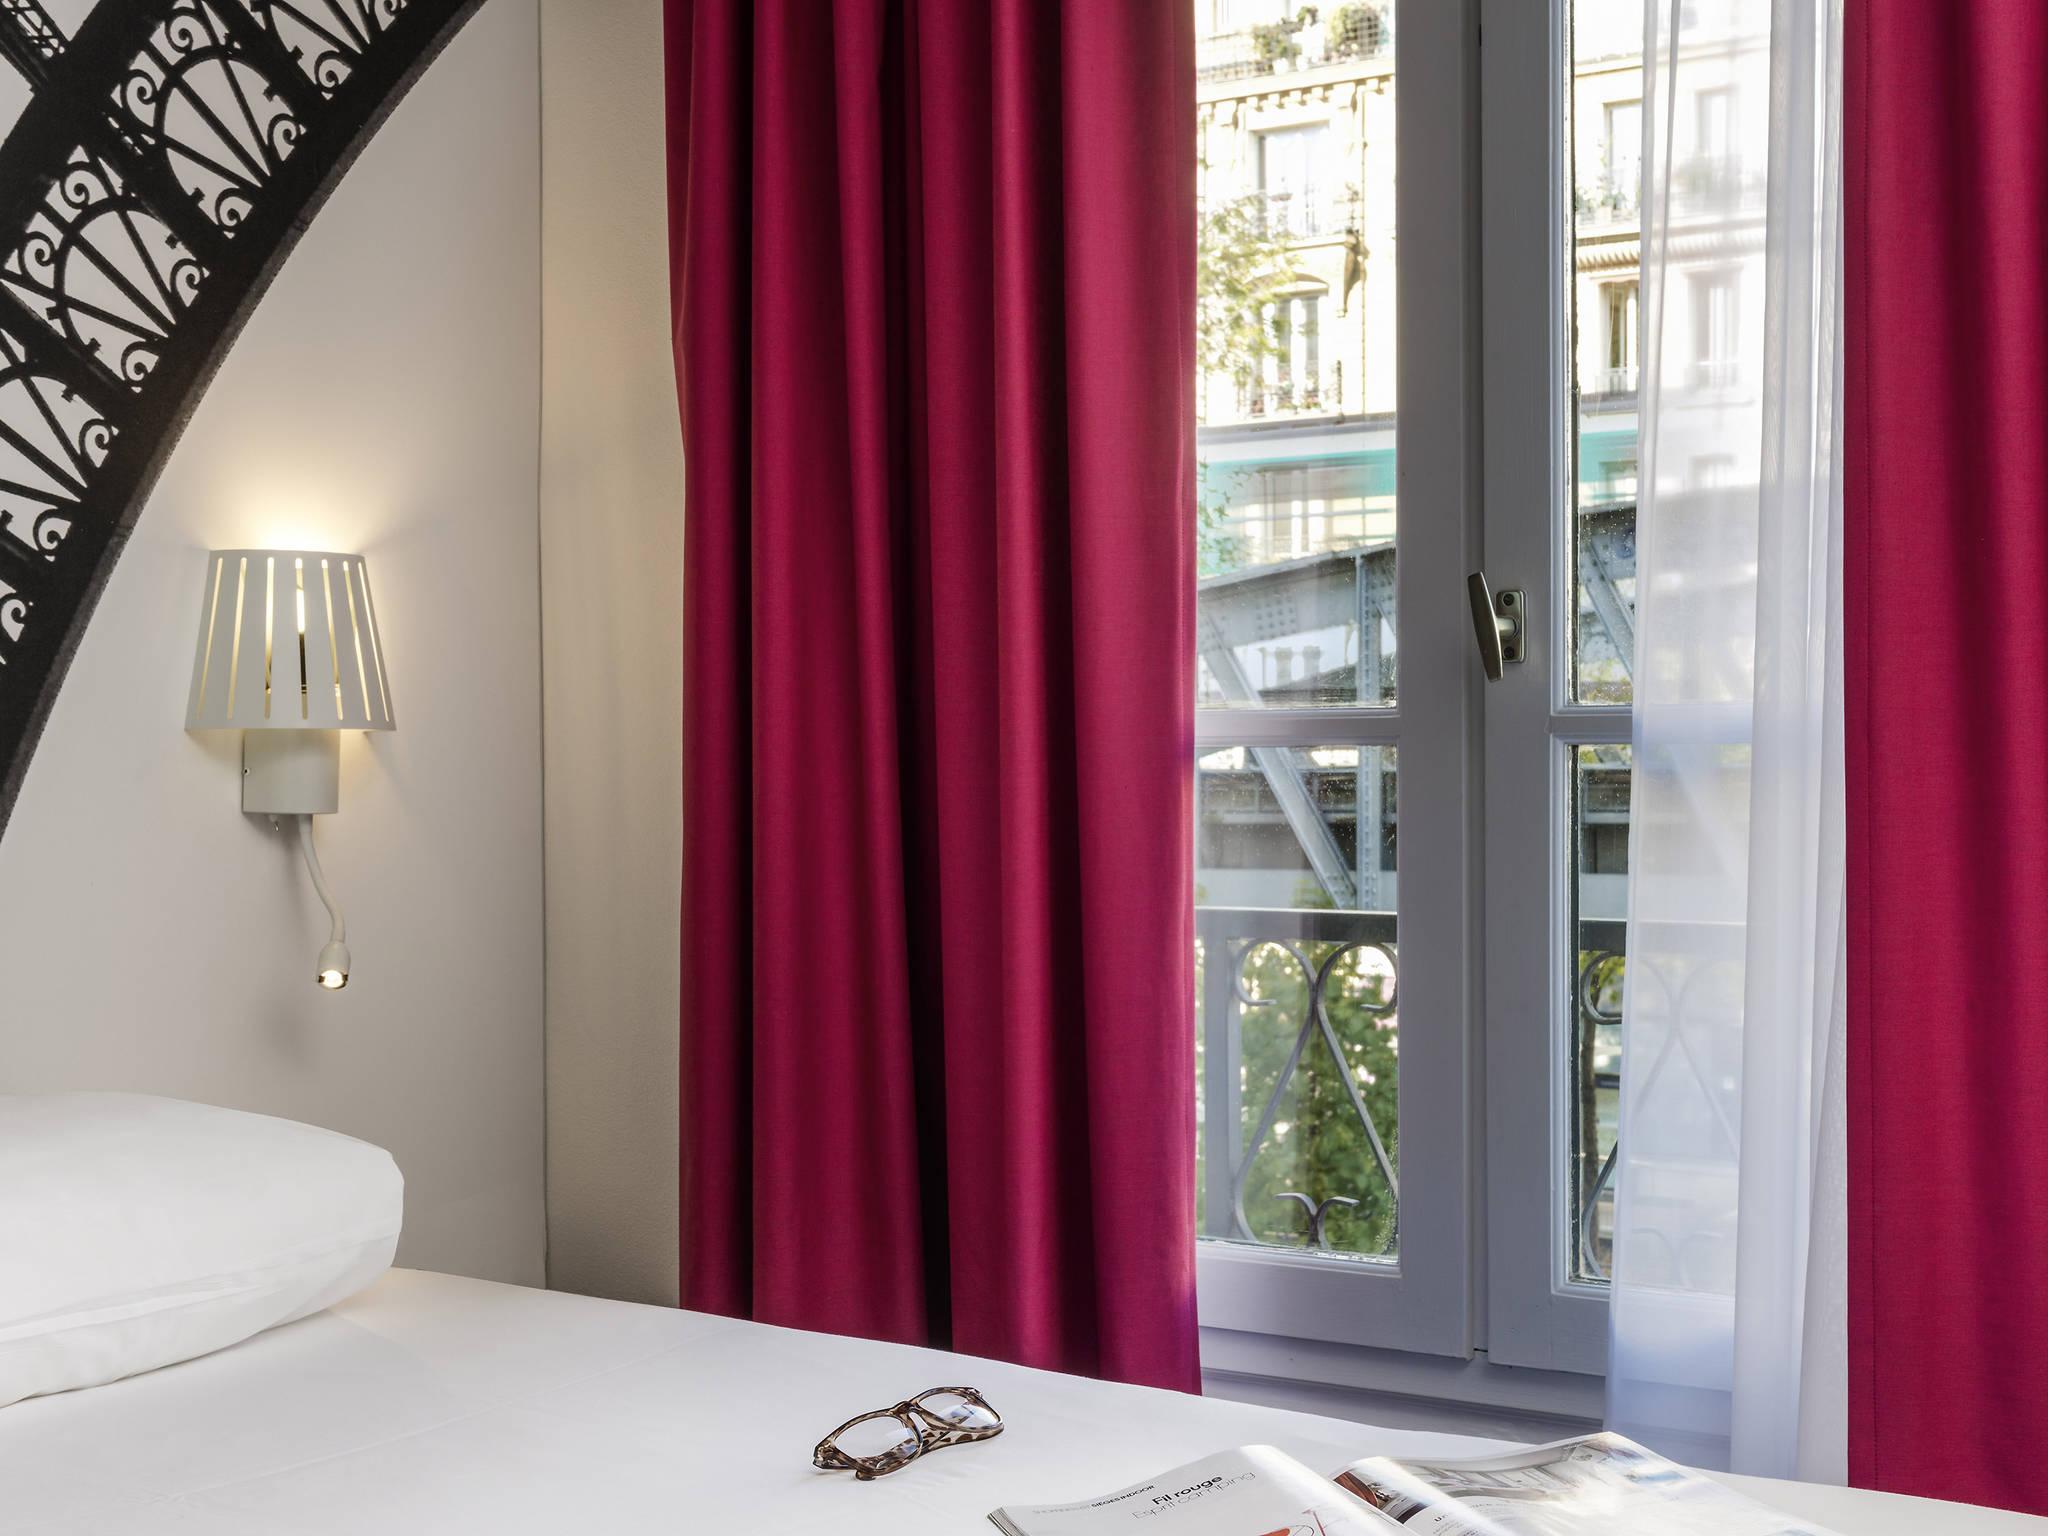 Hotel – ibis Styles Paris Eiffel Cambronne